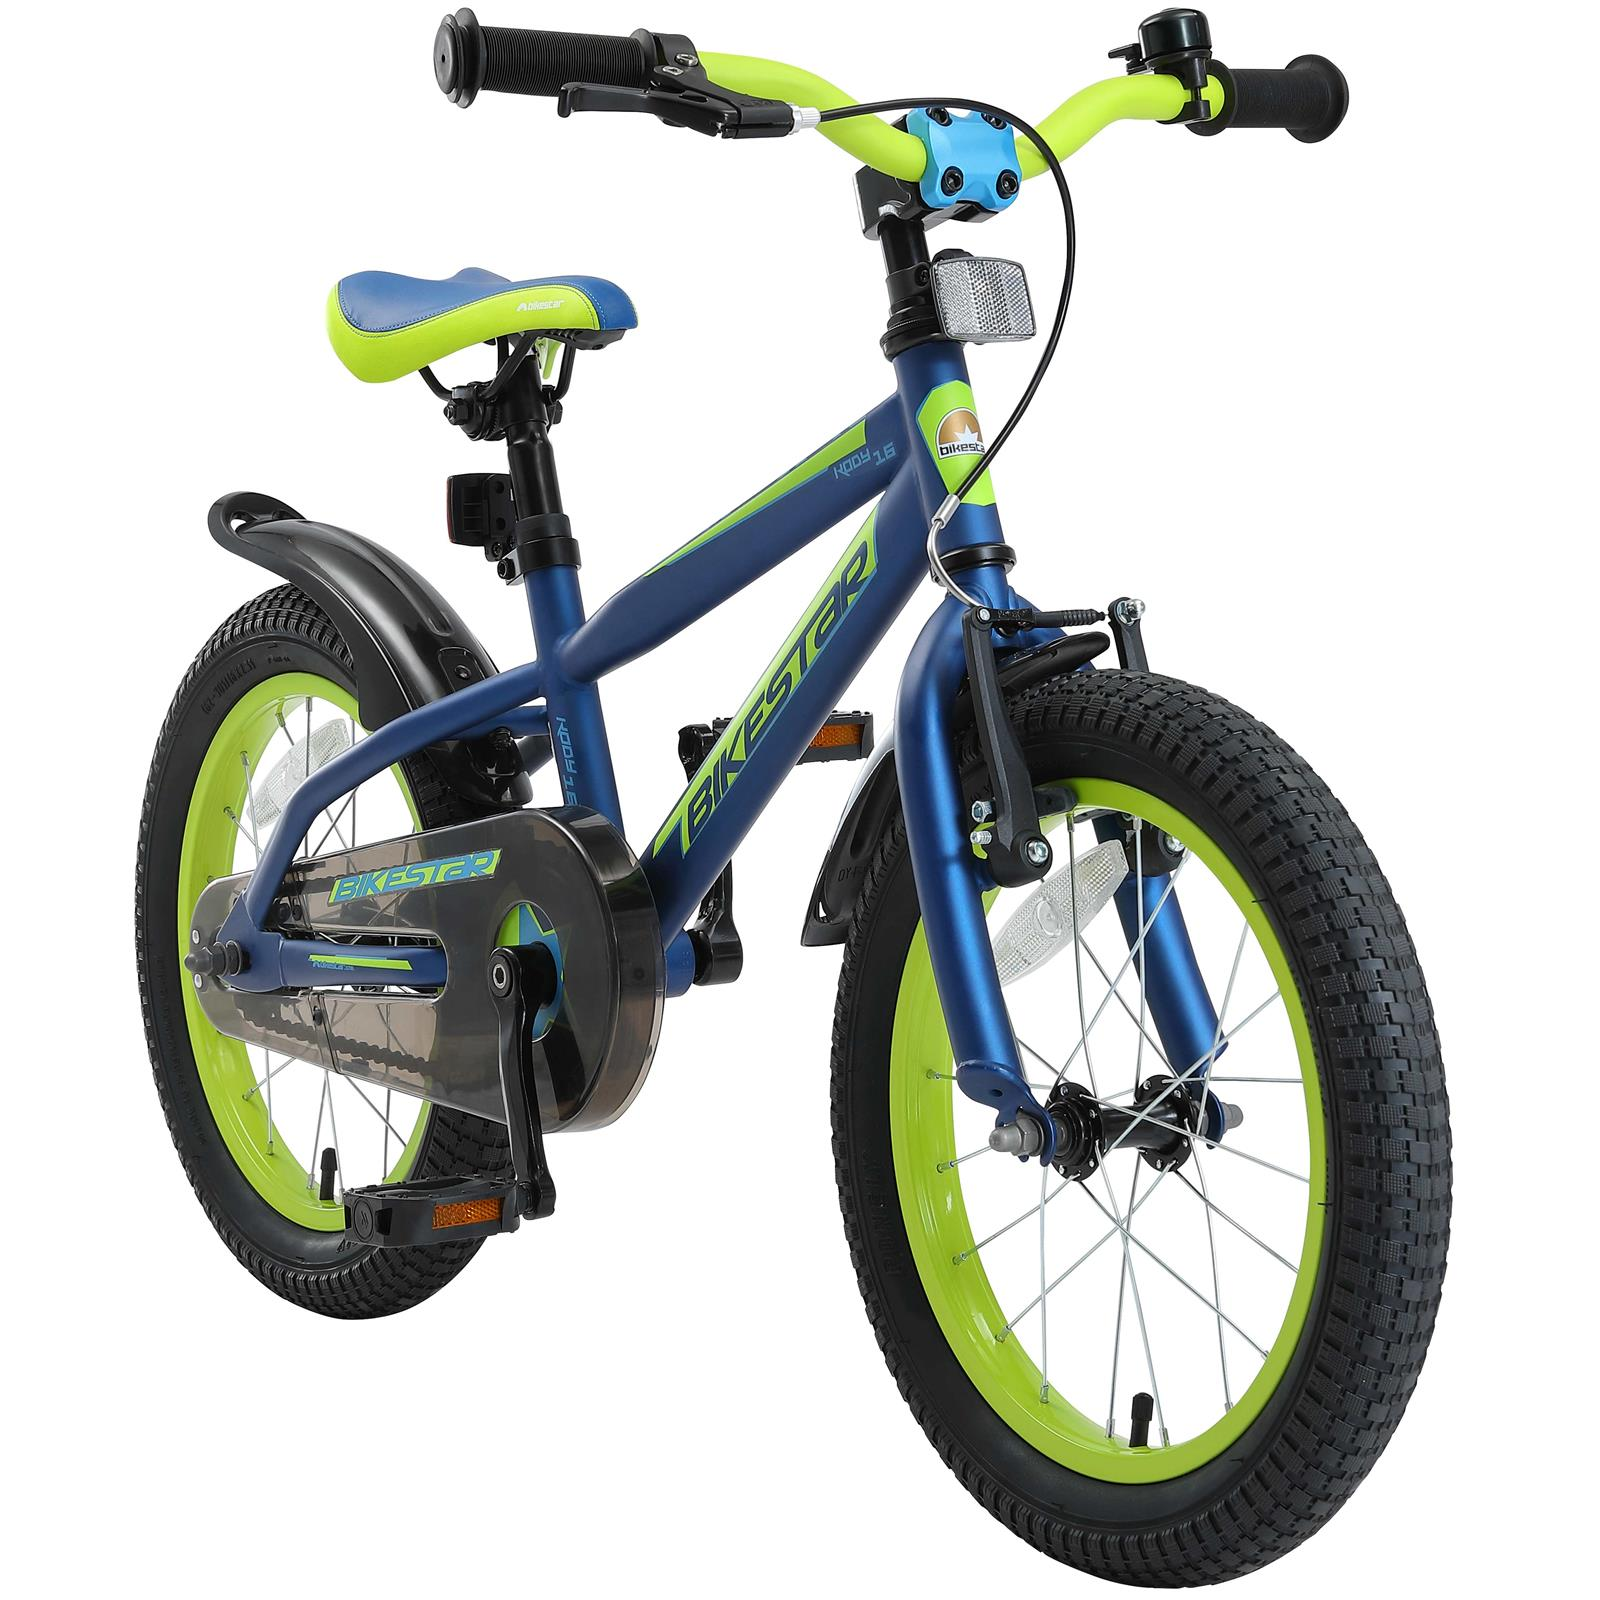 Kinderfahrrad Fahrrad für Kinder ab Jahr 3 Mit Rückbremse Blau 14 Zoll